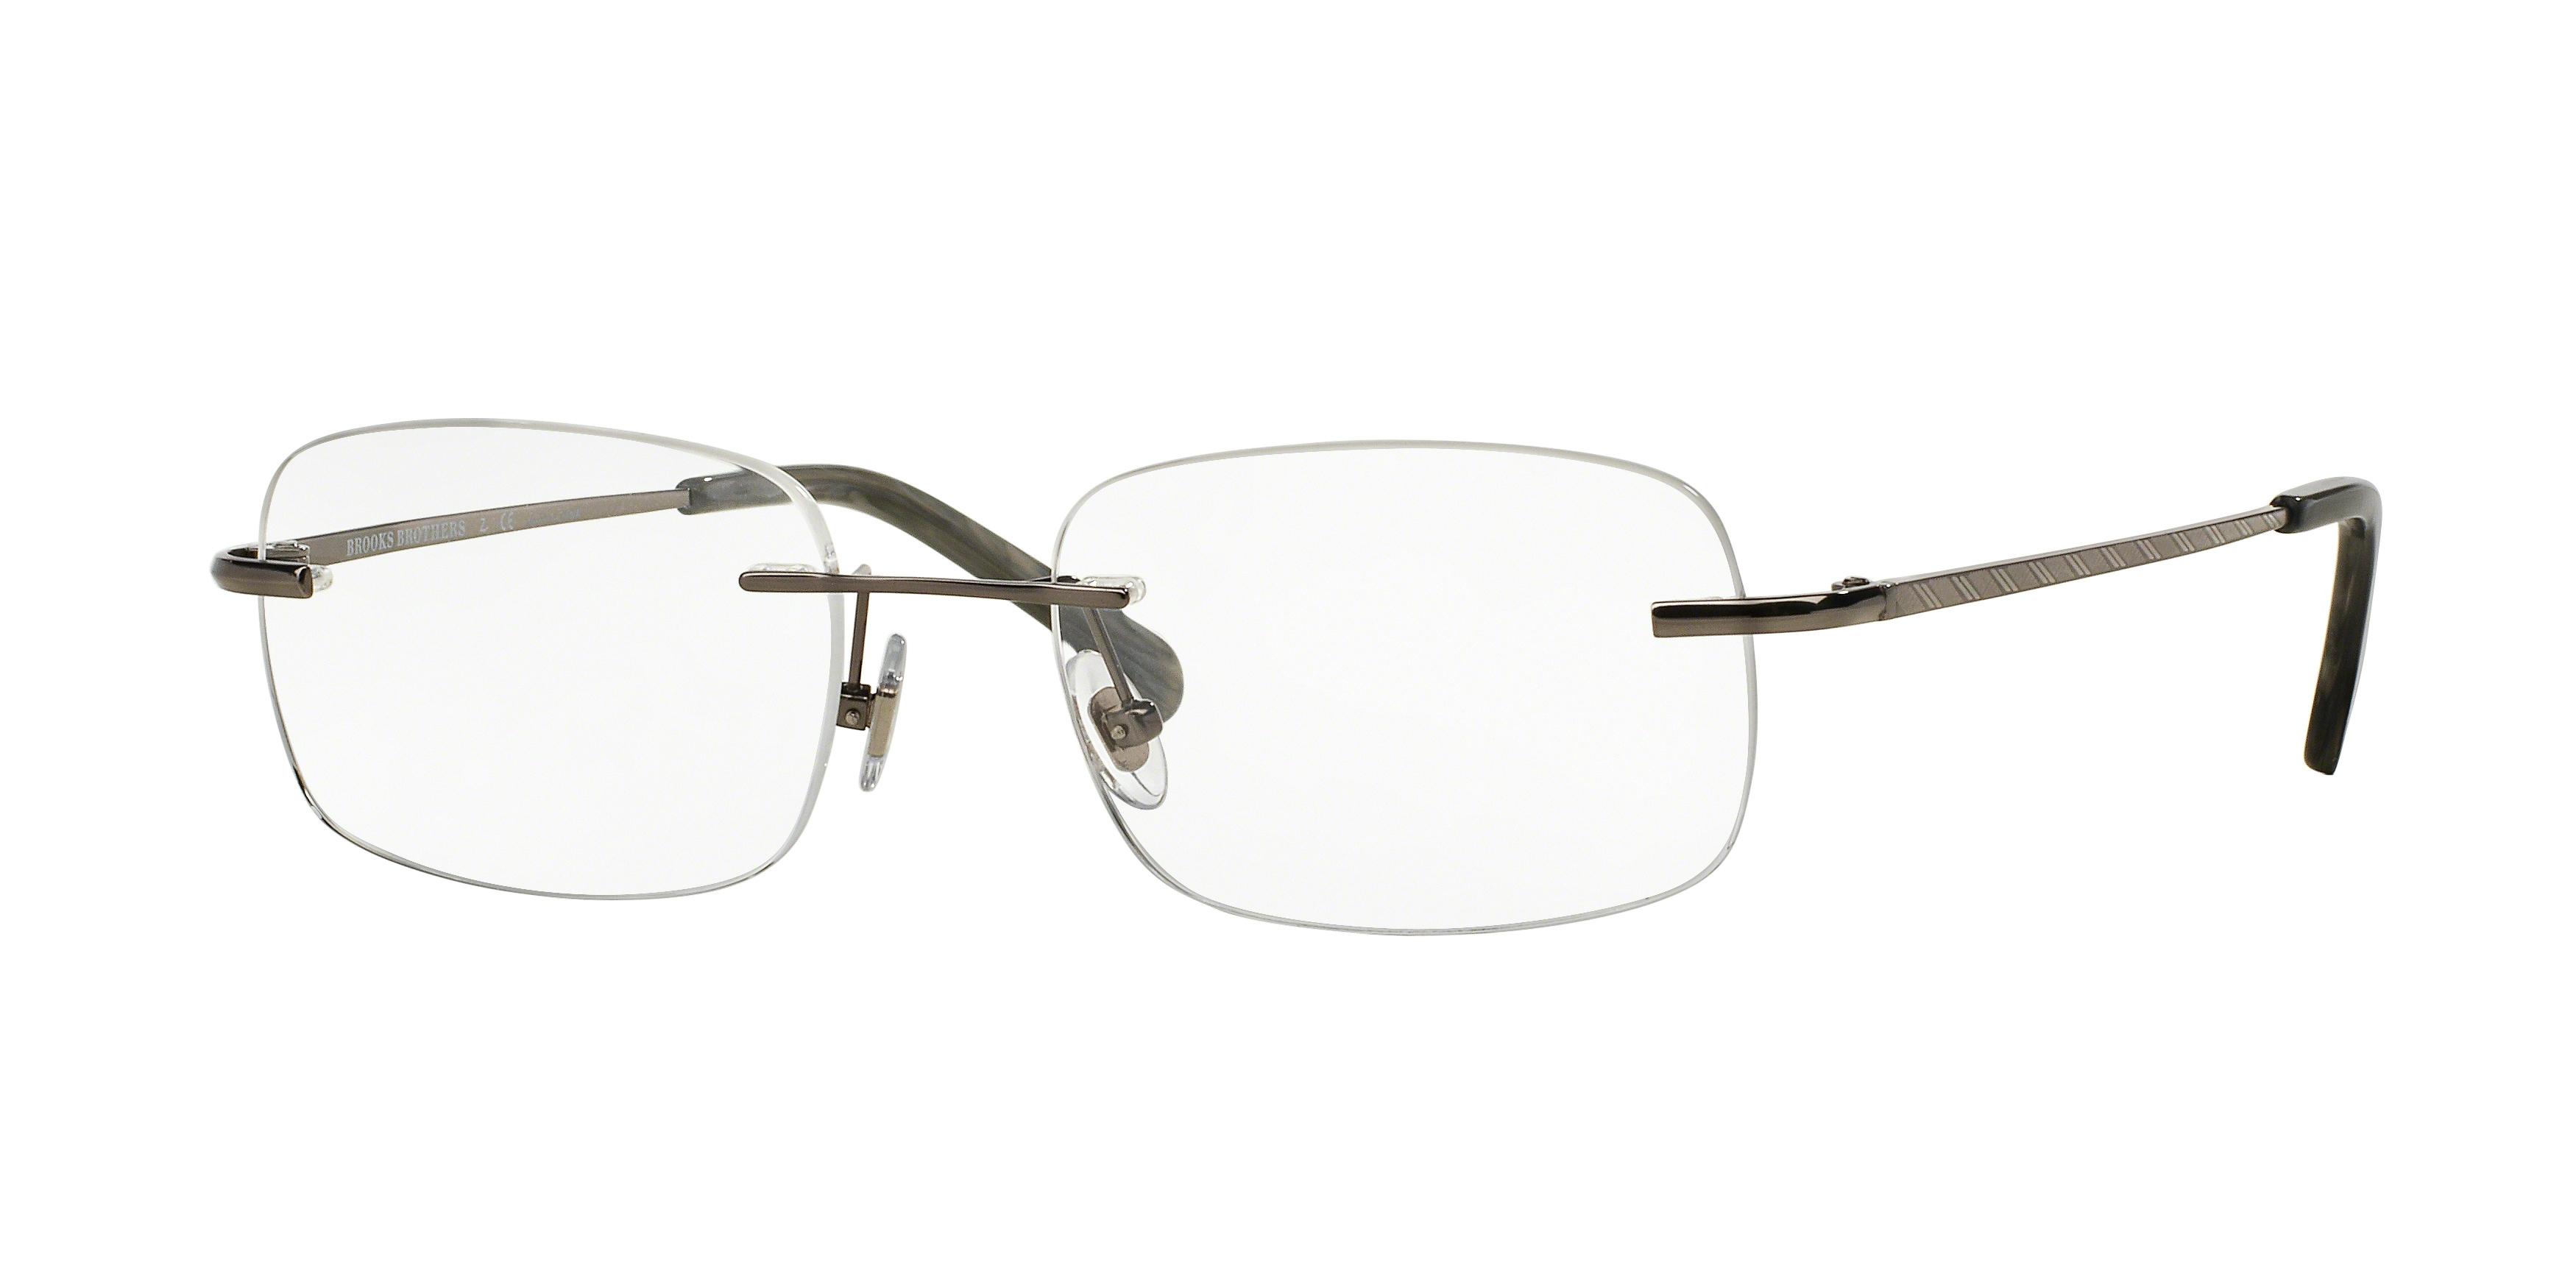 4b0af7f33ff0 Brooks Brothers BB 495T BB495T Prescription Eyeglasses